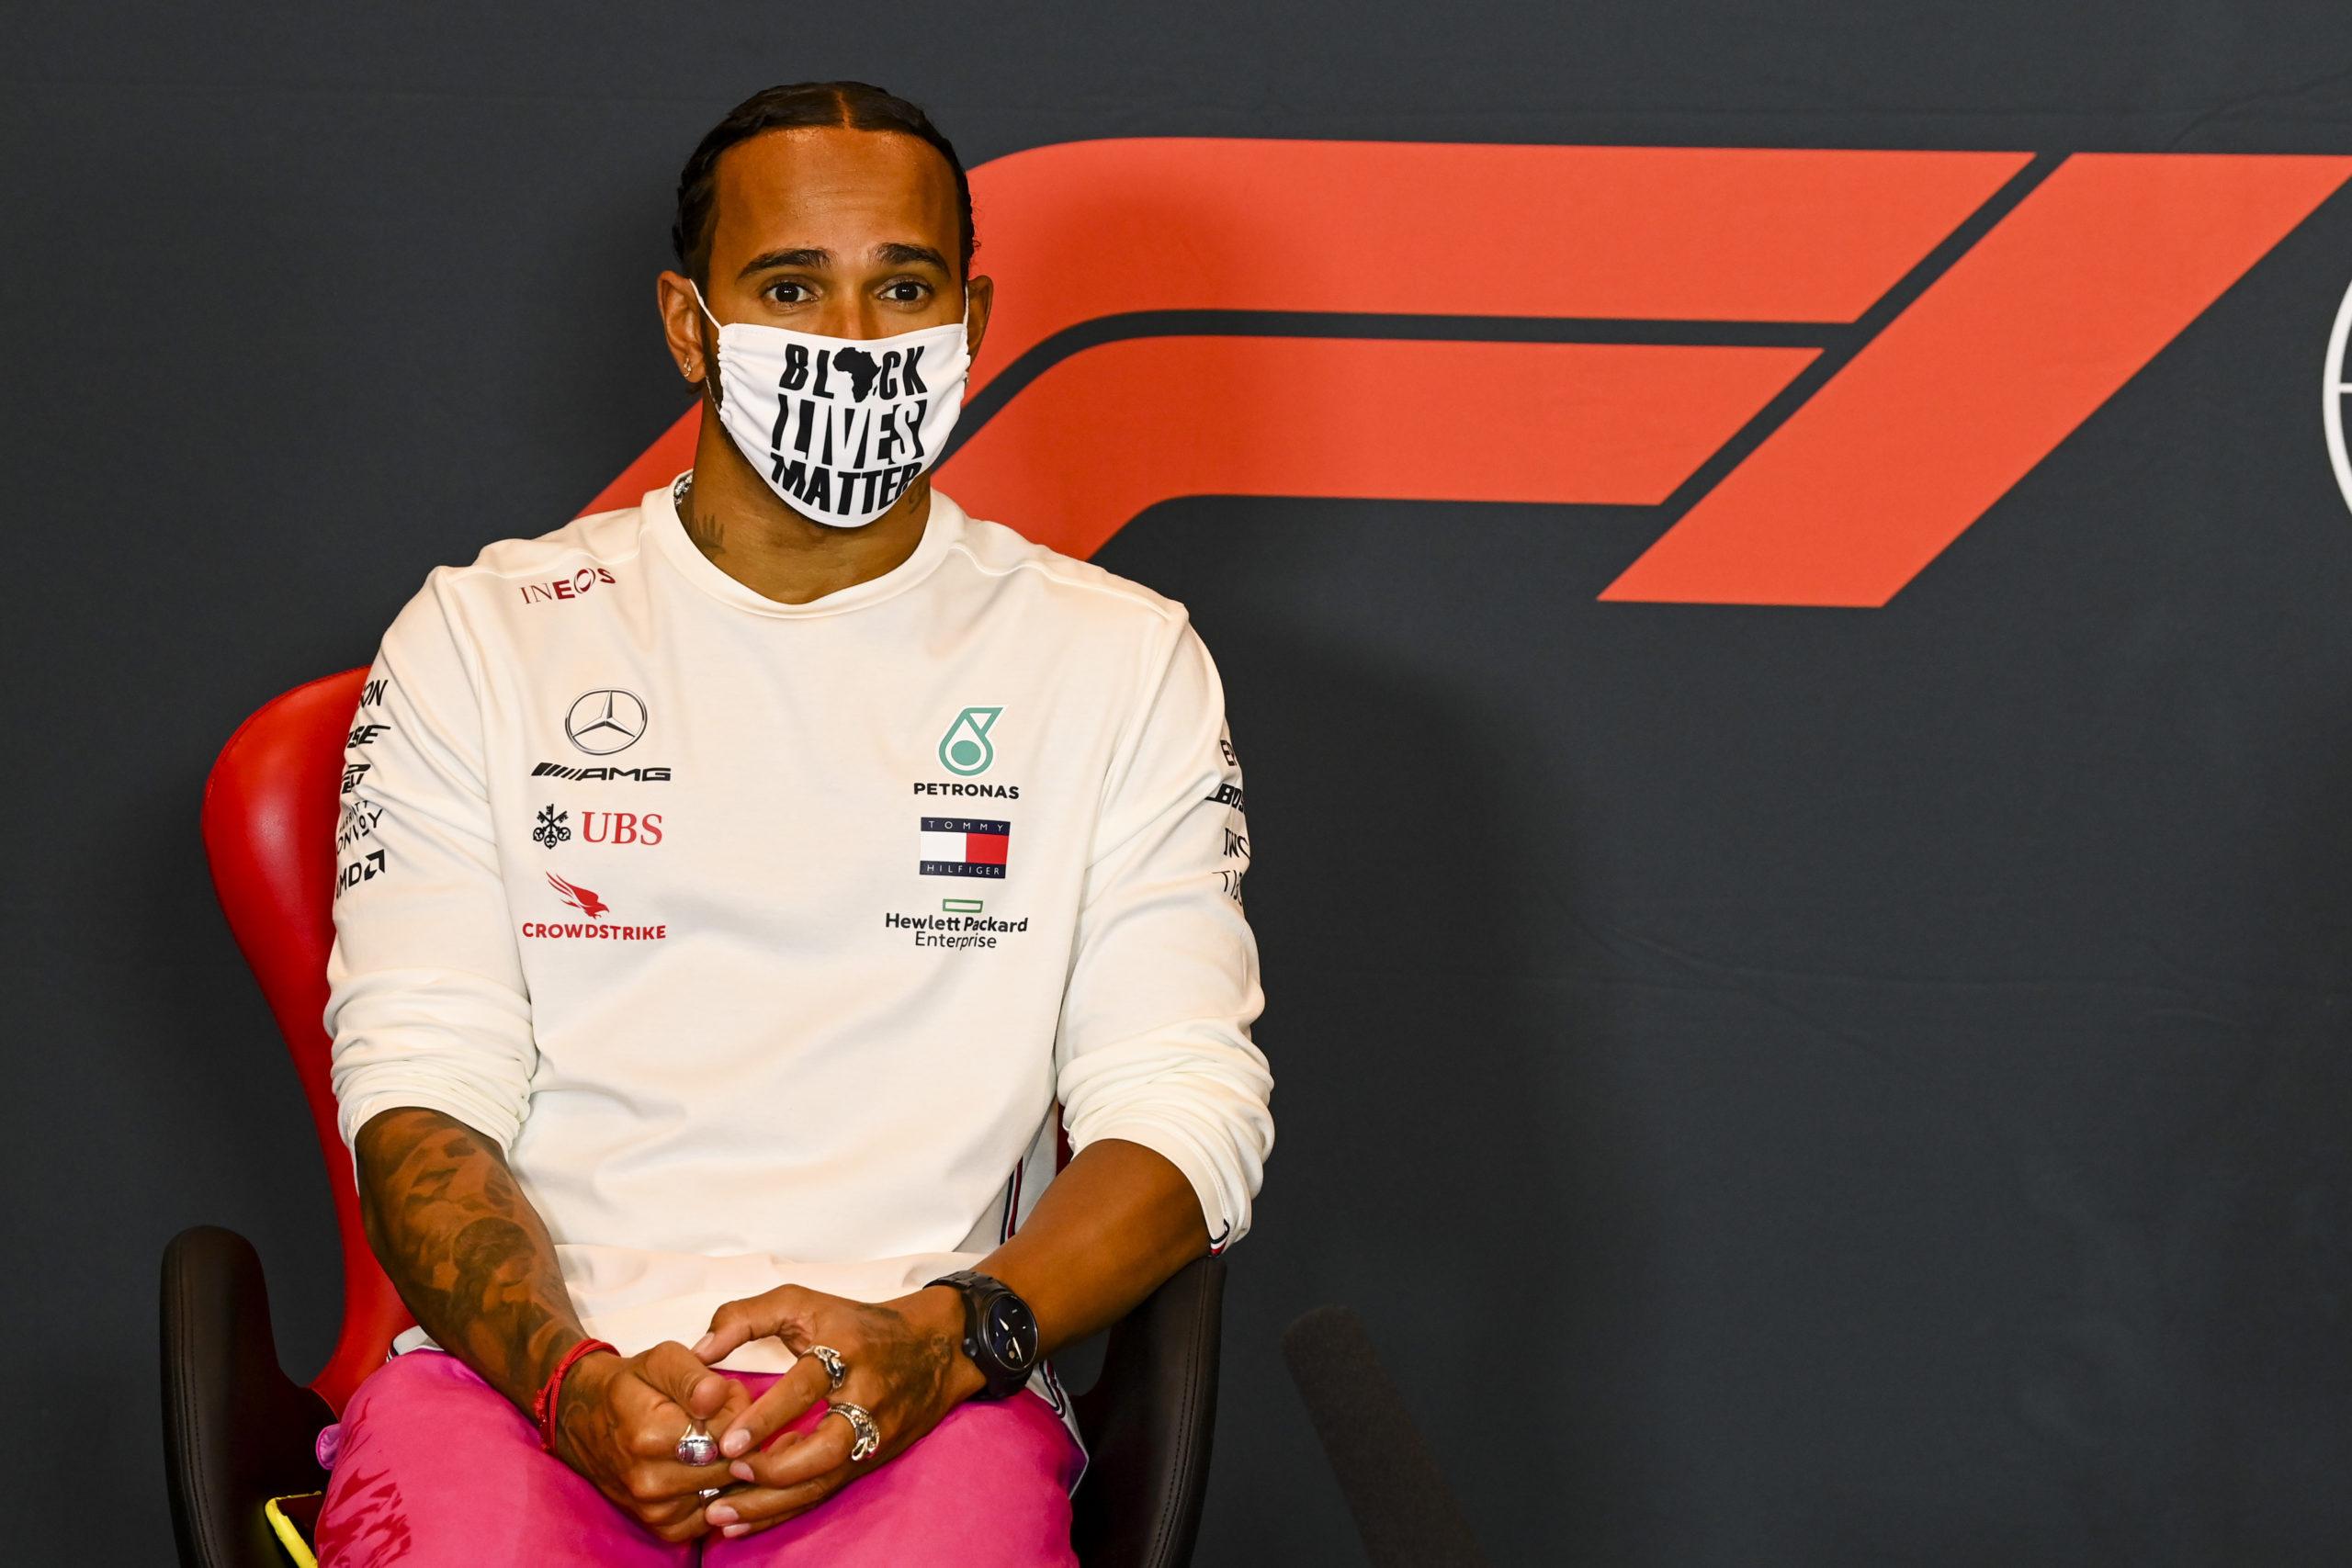 2020 Emilia Romagna Grand Prix, Friday - LAT Images, Mercedes, Hamilton